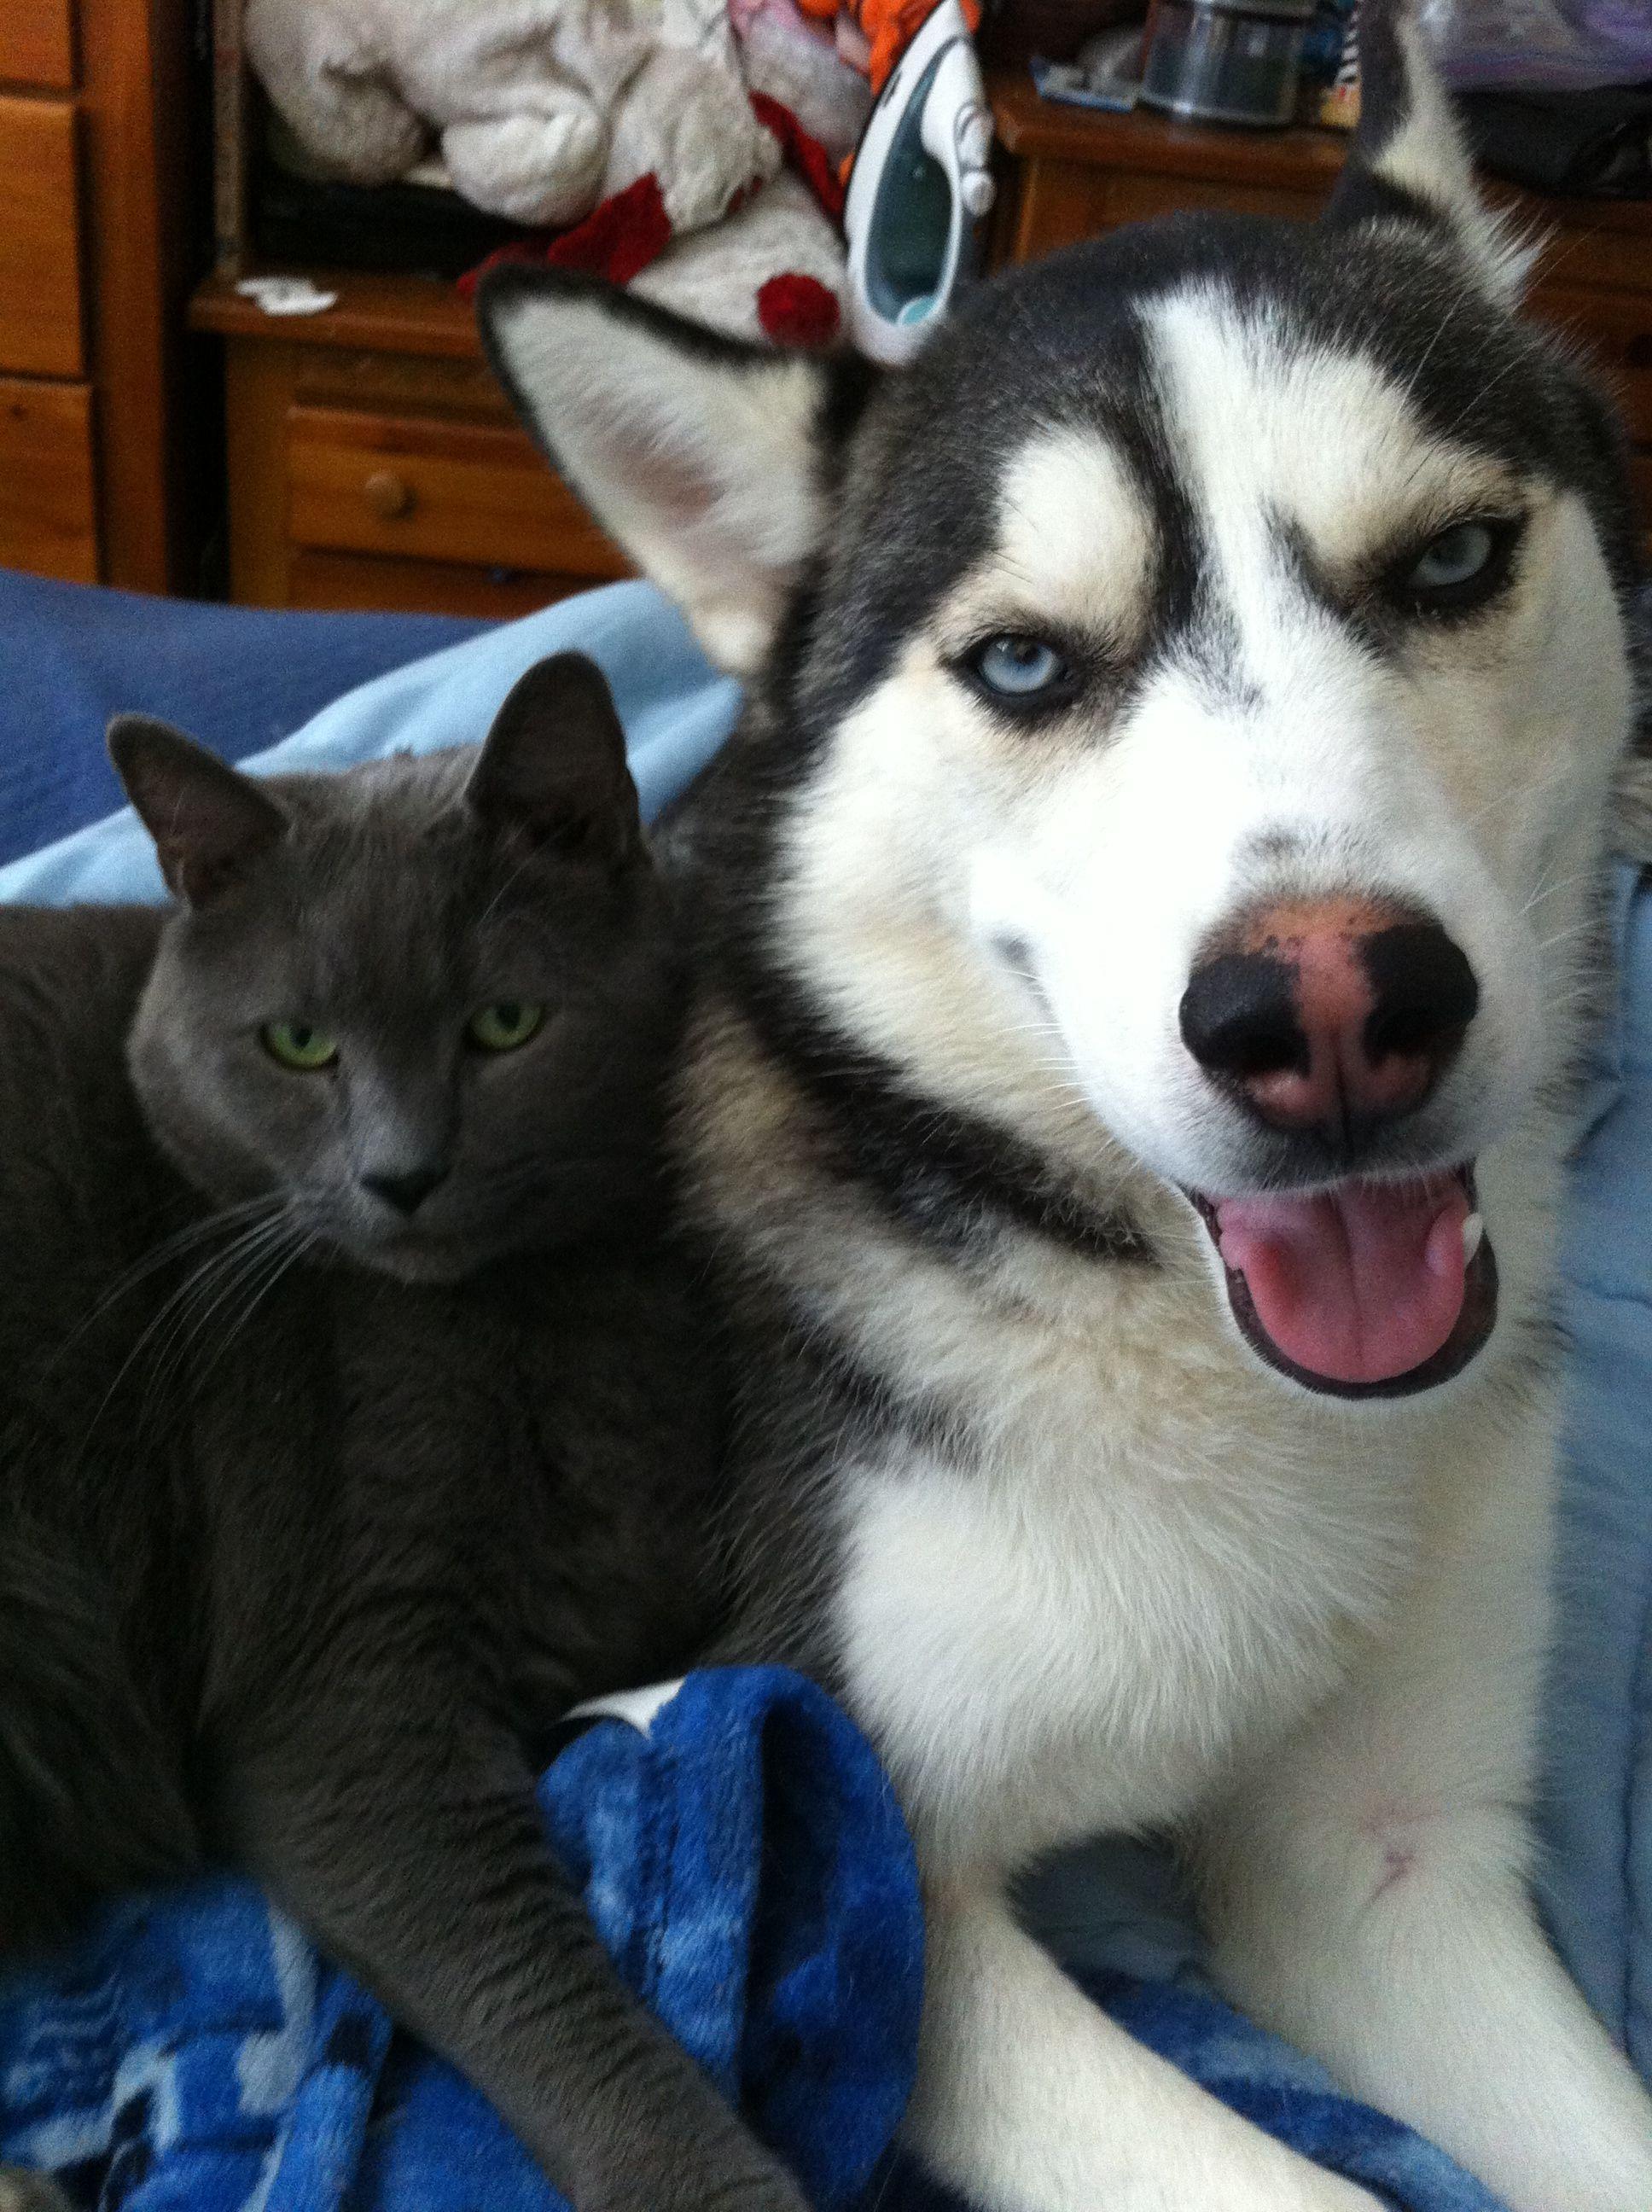 Siberian Husky And Russian Blue Cat Russian Blue Cat Russian